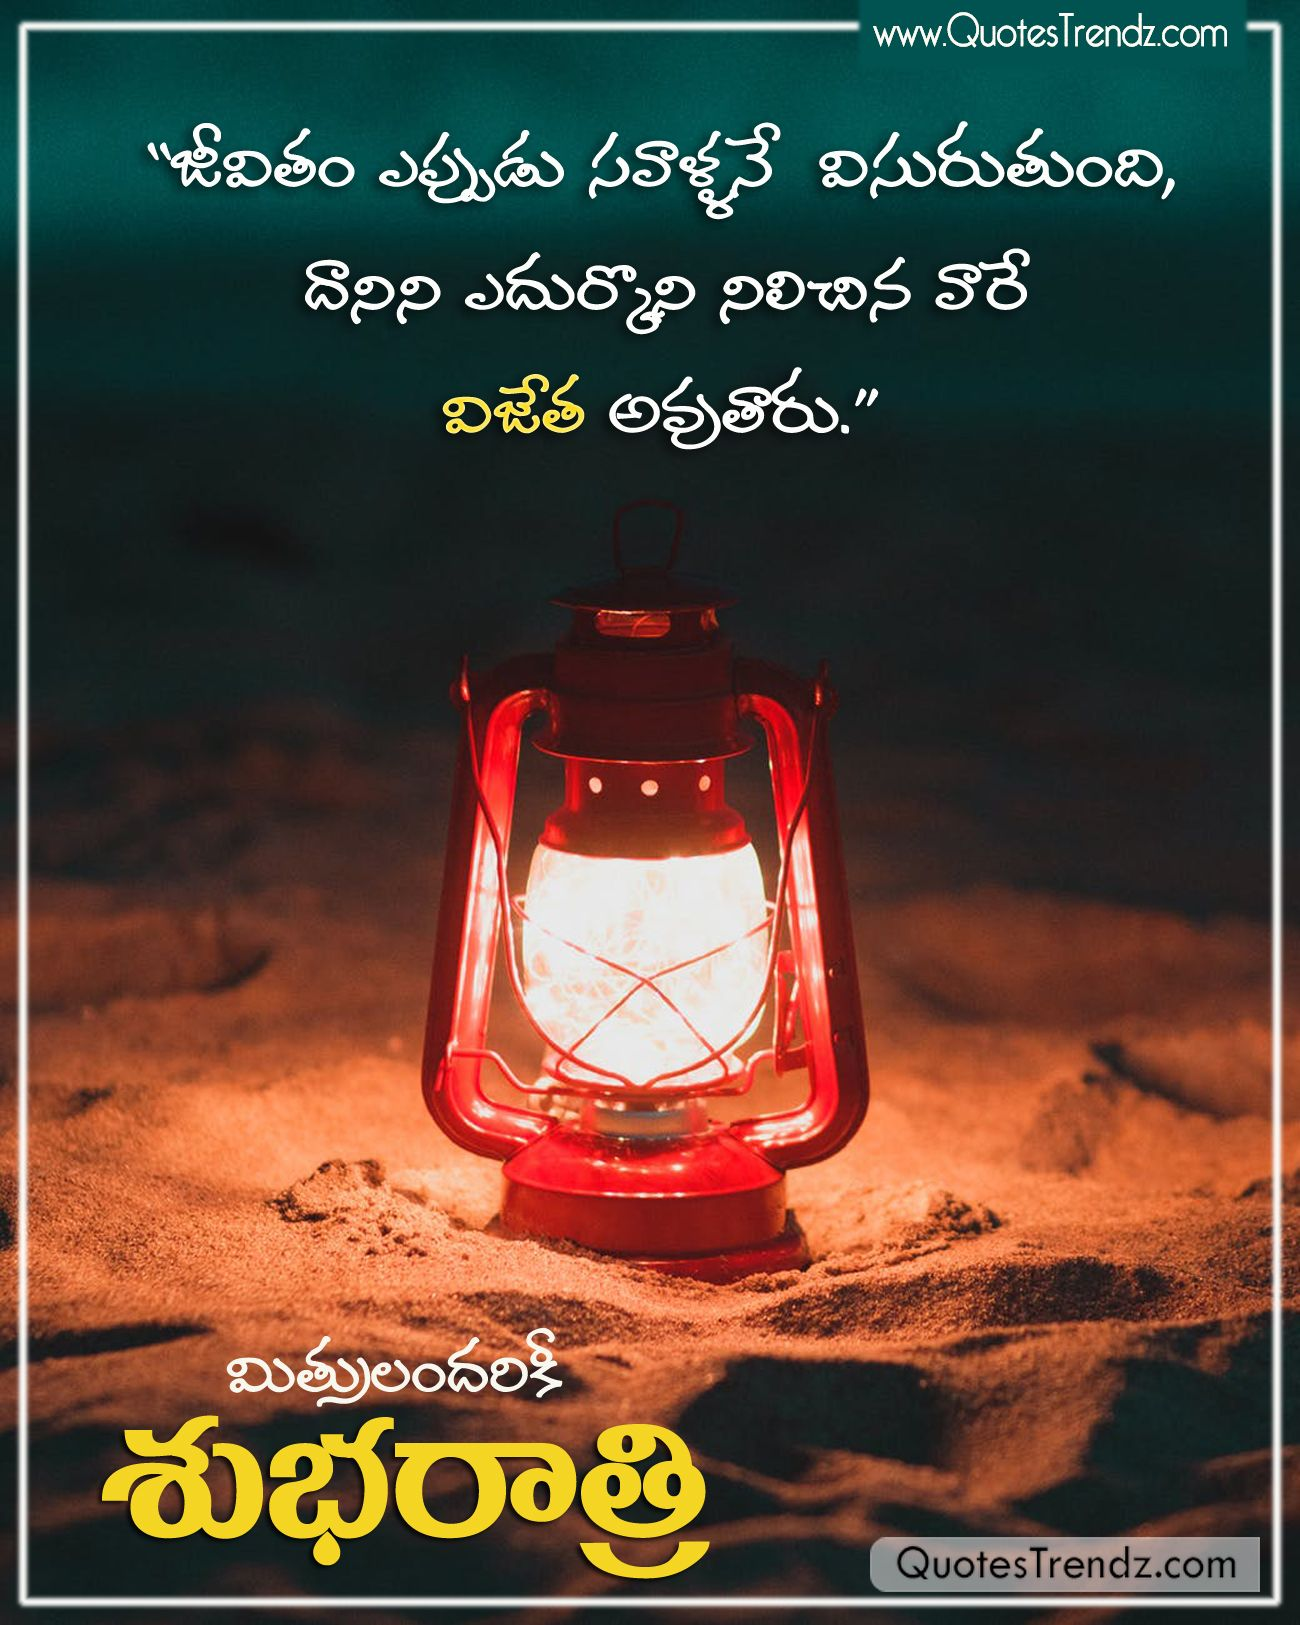 Telugu Good Night Quotes Good Night Quotes Good Night Greetings Night Quotes